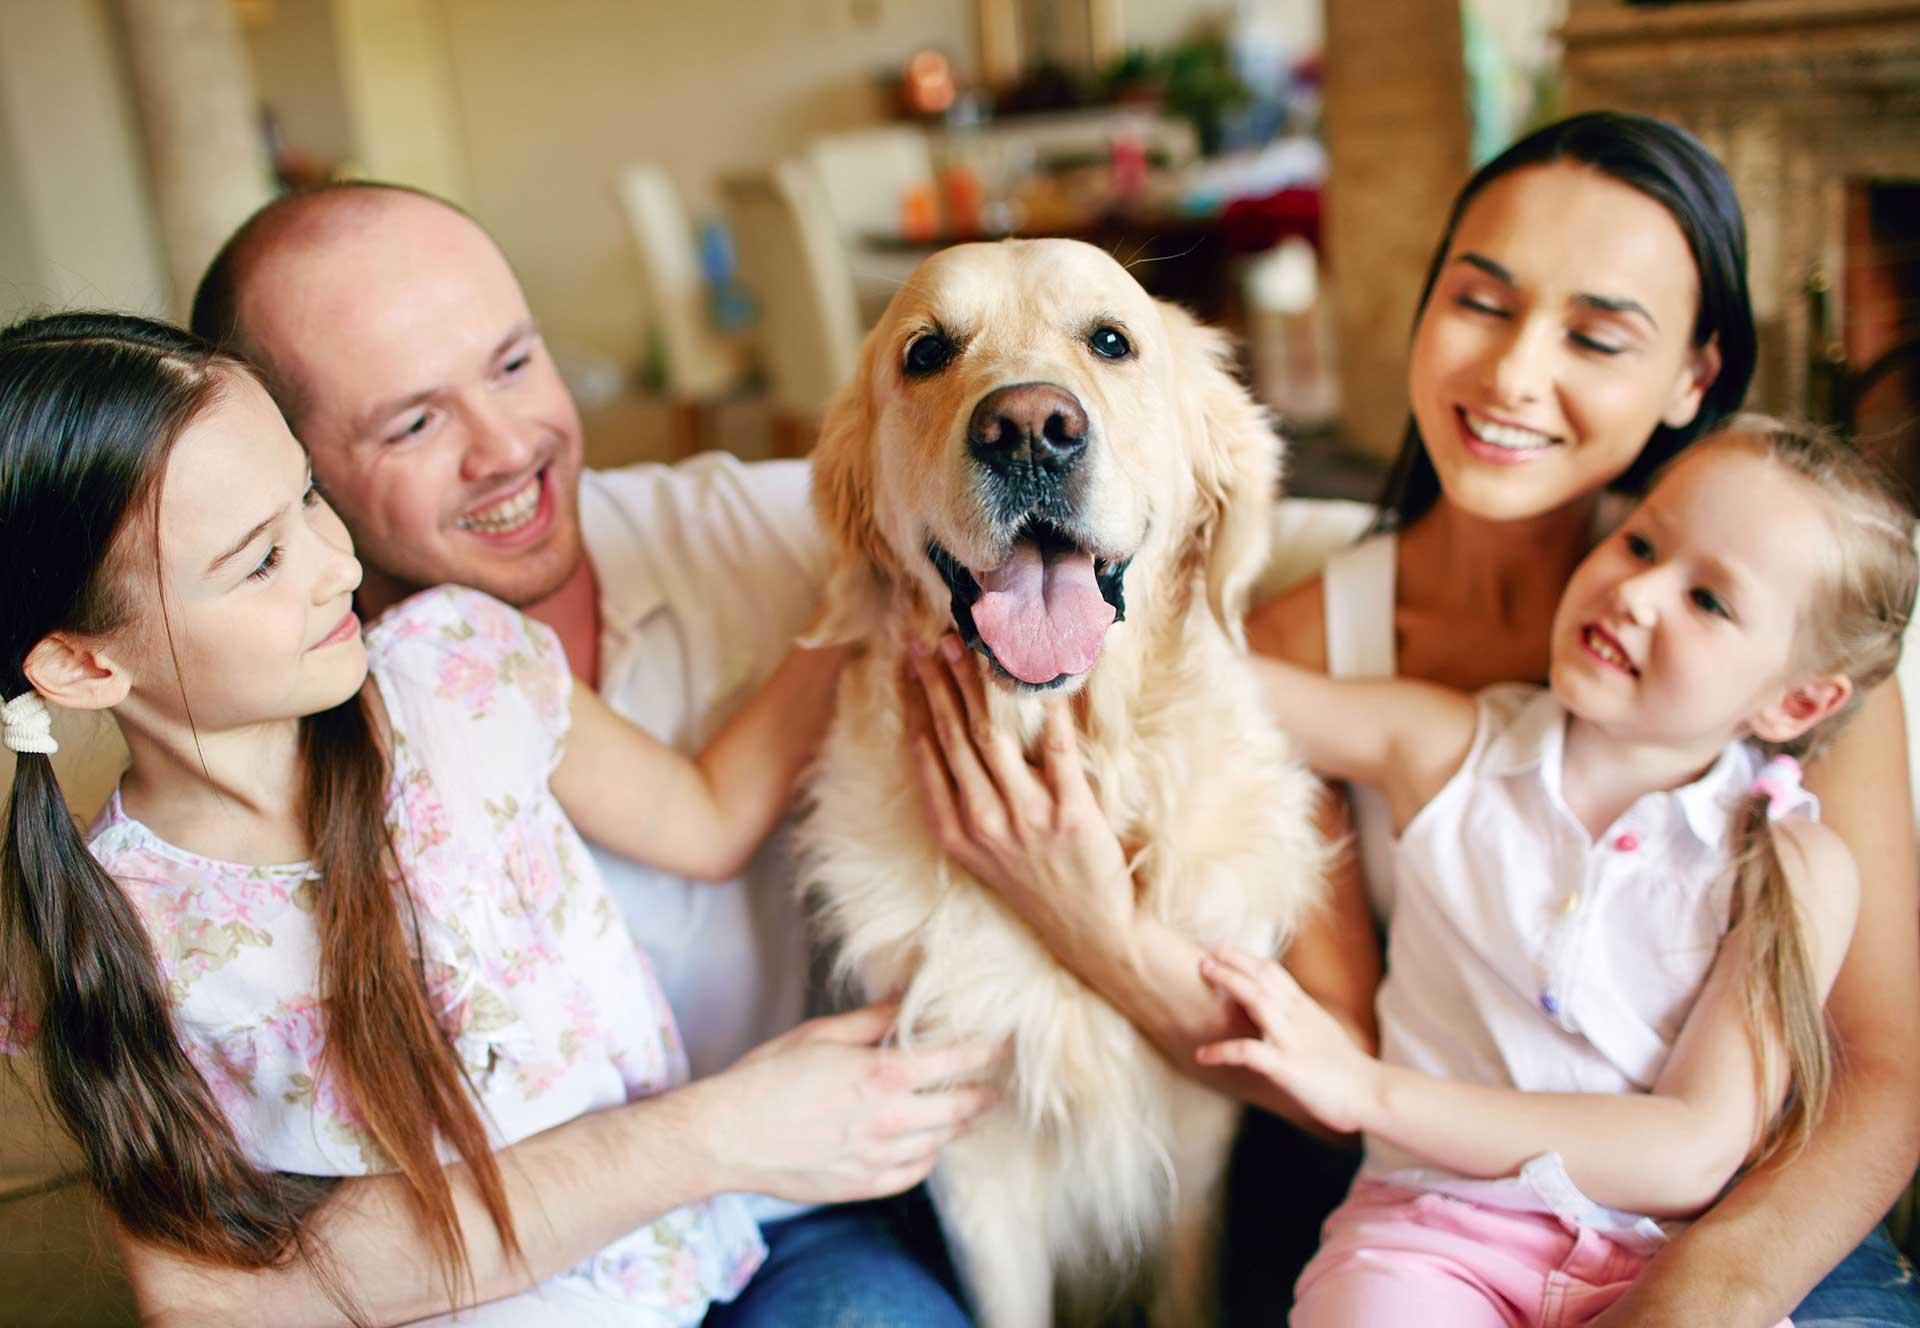 Dog Family Petting